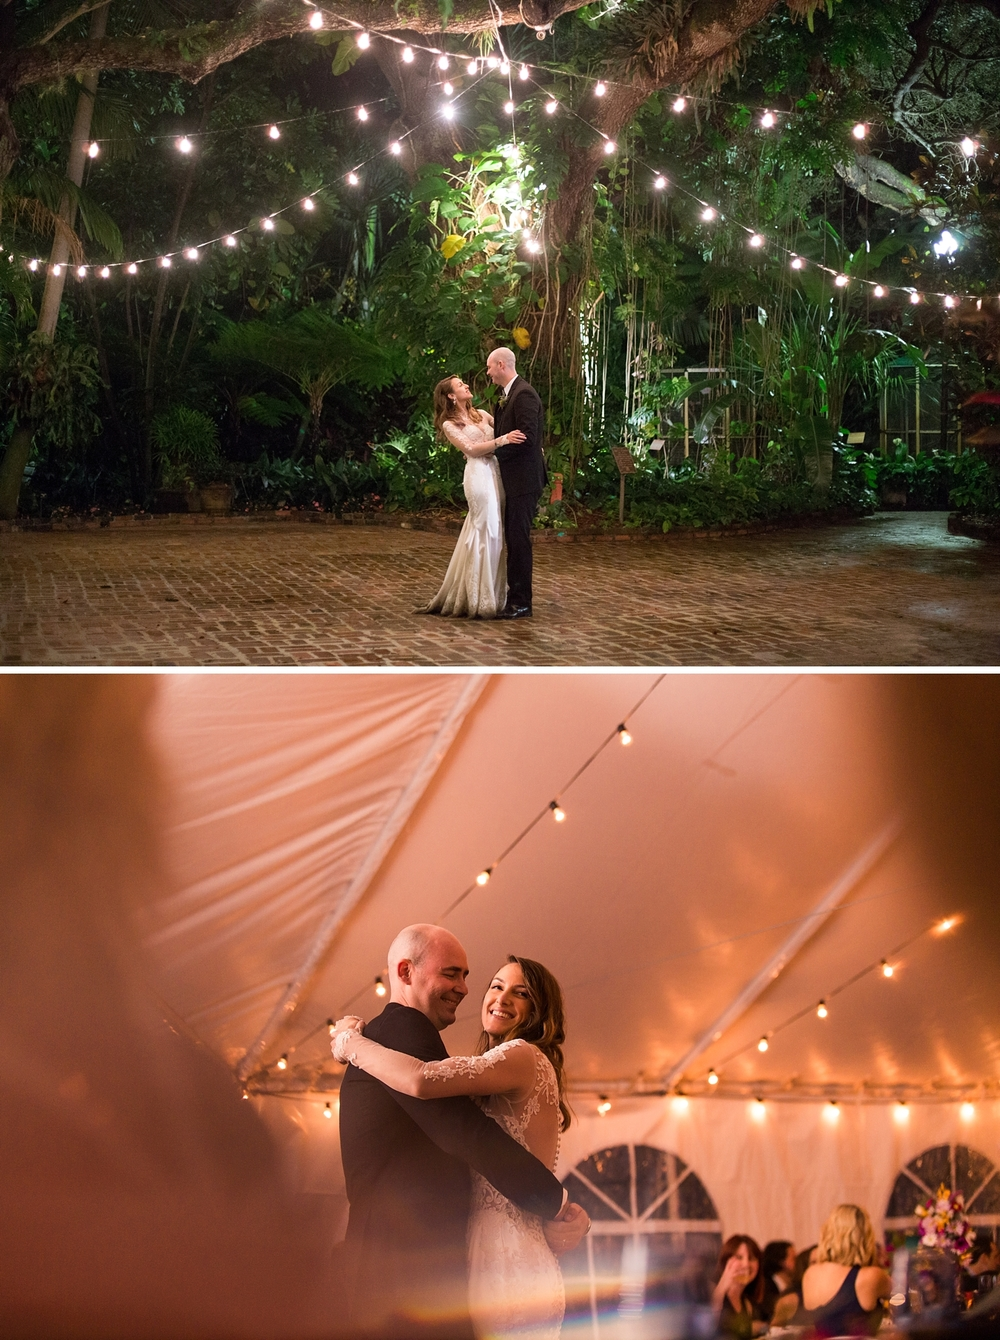 orlando-wedding-photography-justin-gilbert-tampa-sunken-gardens_0017.jpg